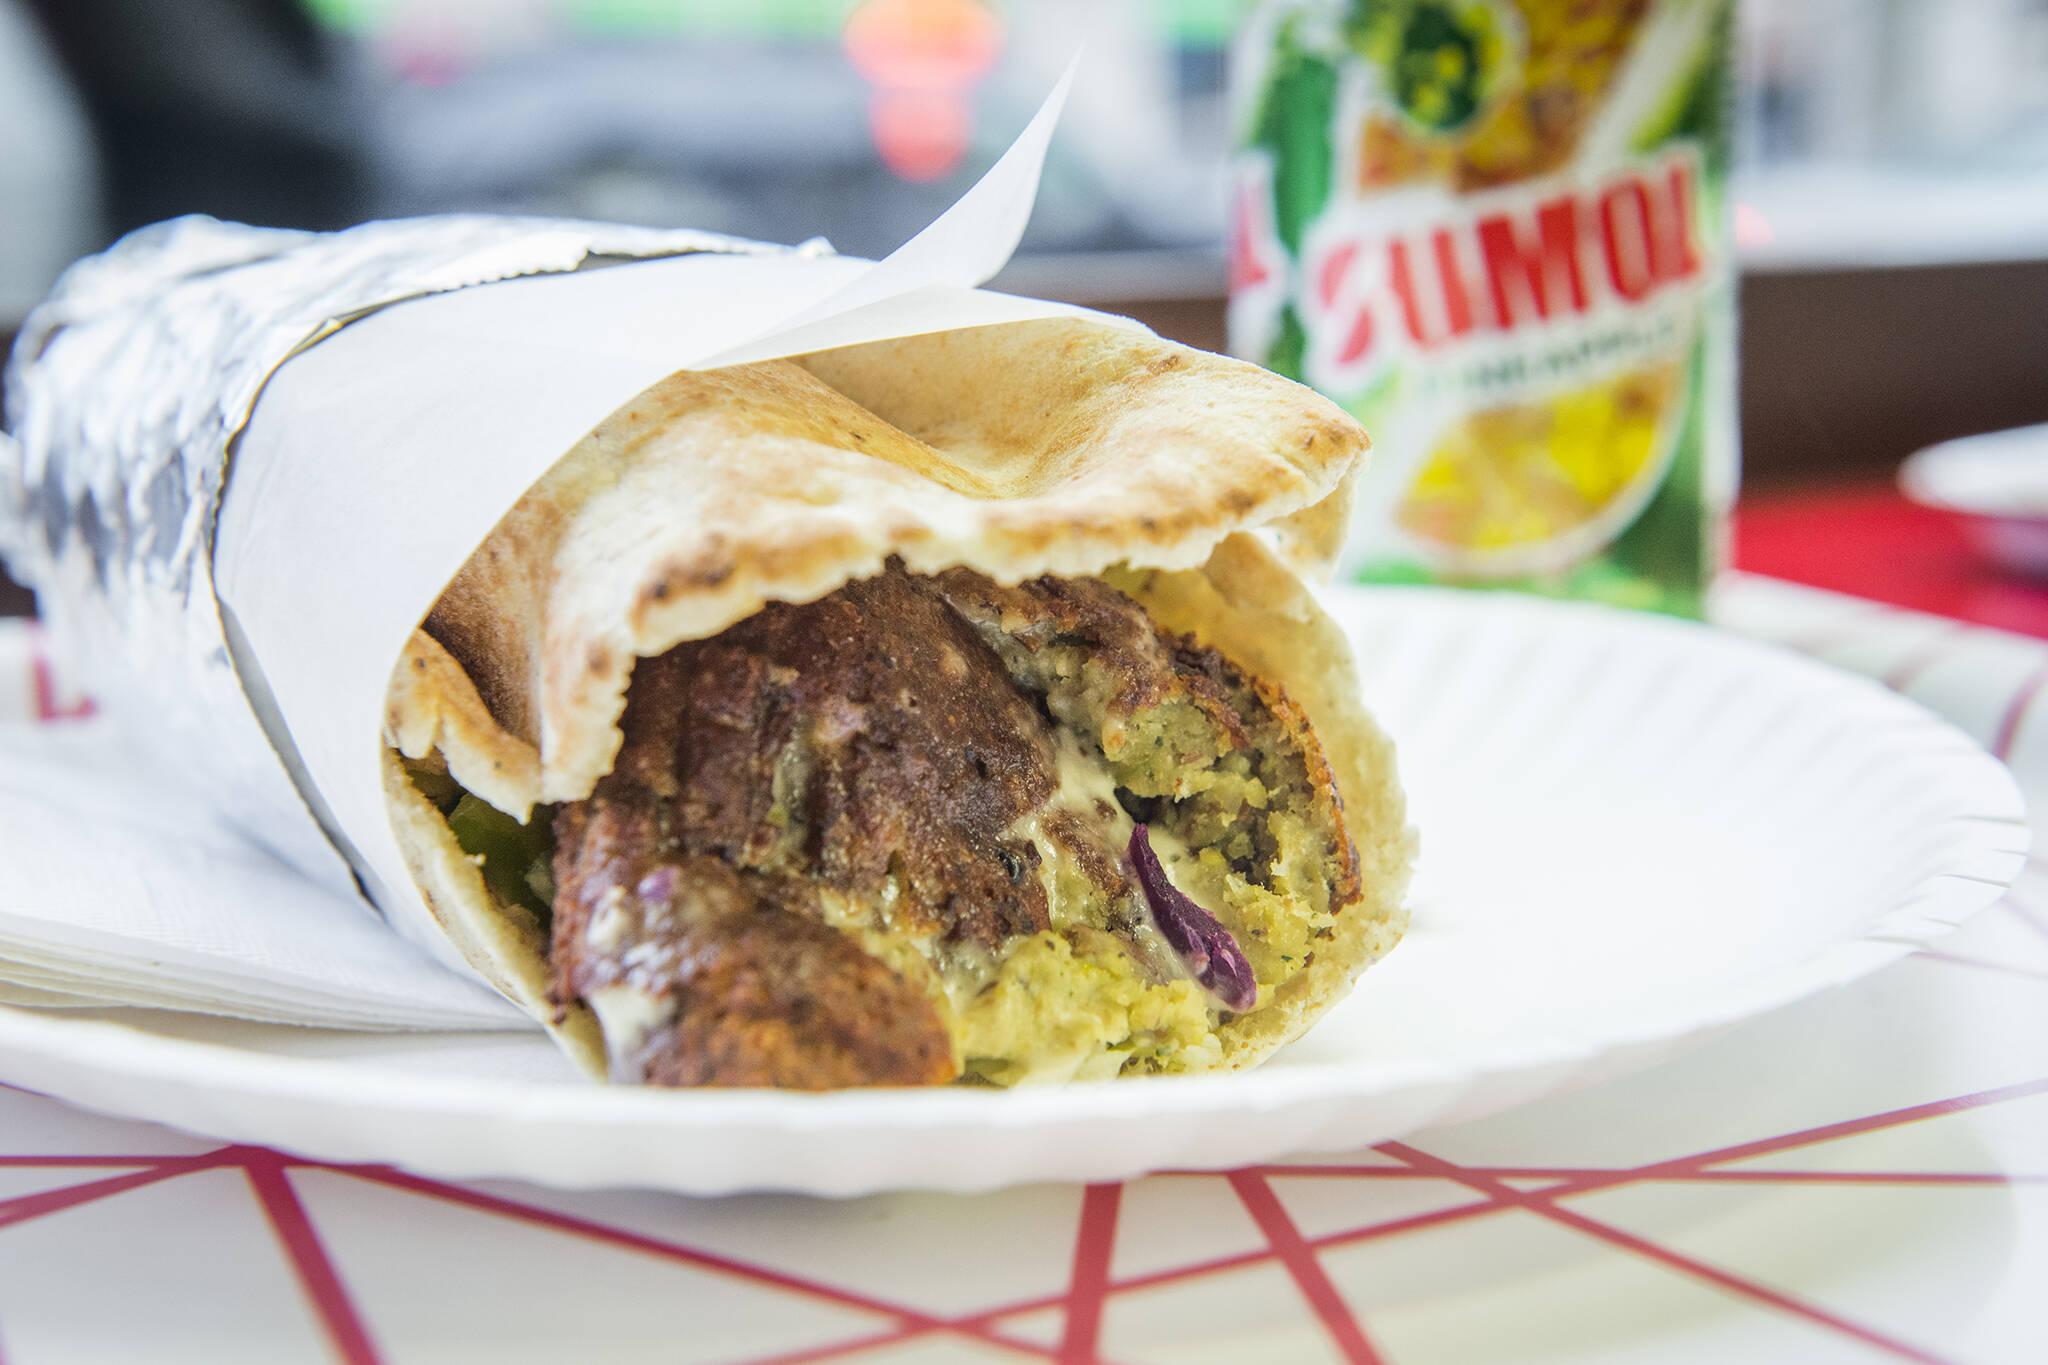 College Falafel Toronto